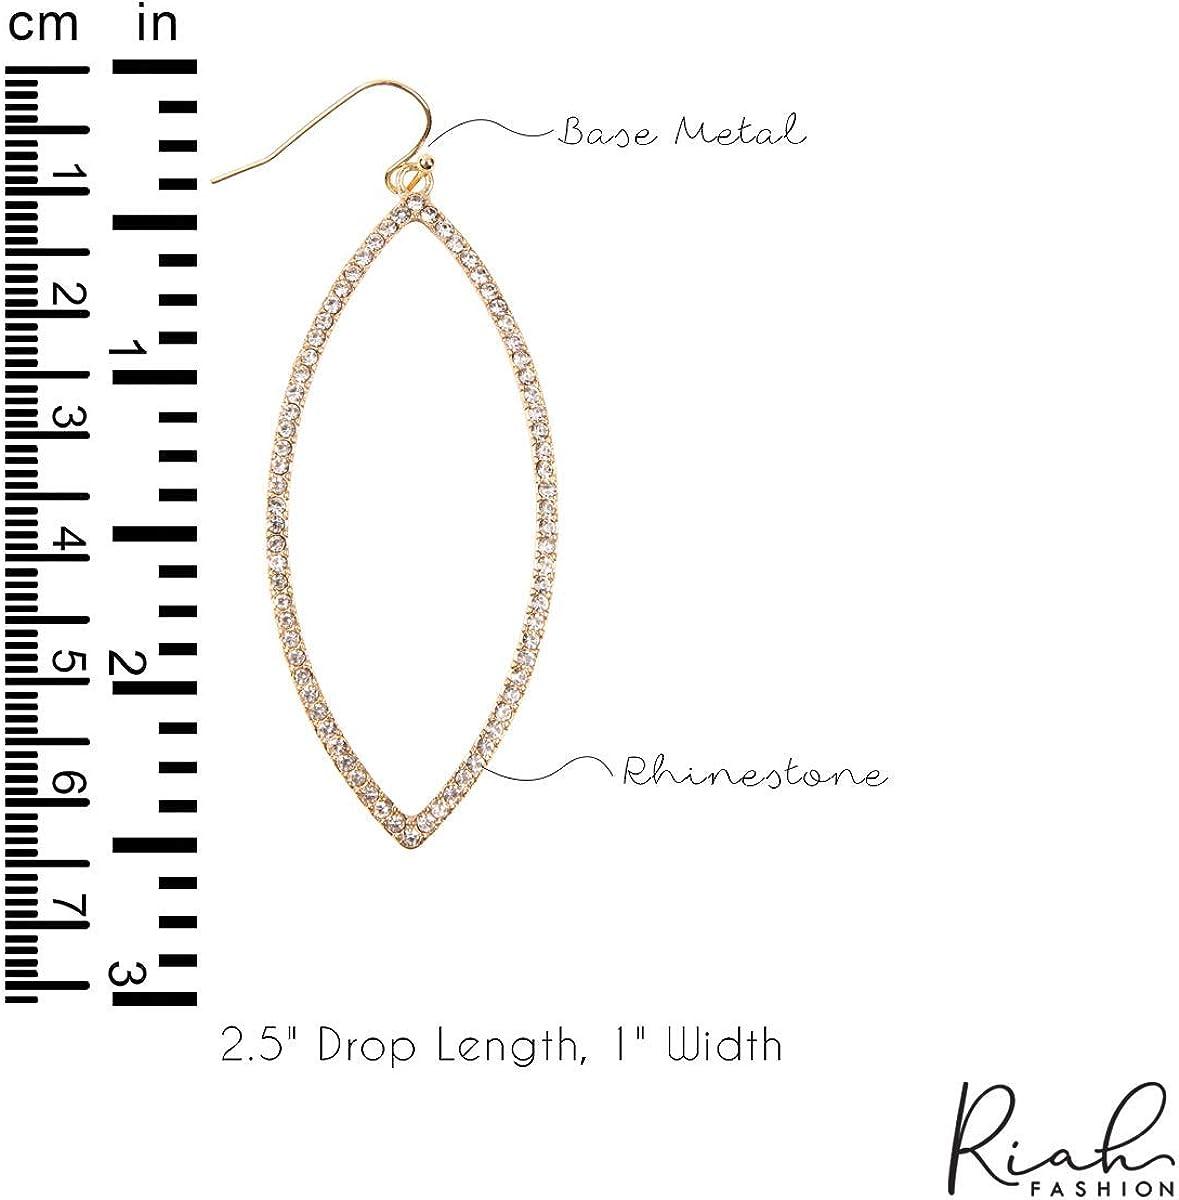 Marquise Circle Acrylic Pearl Dangles Teardrop Pear RIAH FASHION Sparkly Rhinestone Lightweight Geometric Hoop Drop Earrings Oval Multi Cubic Crystal